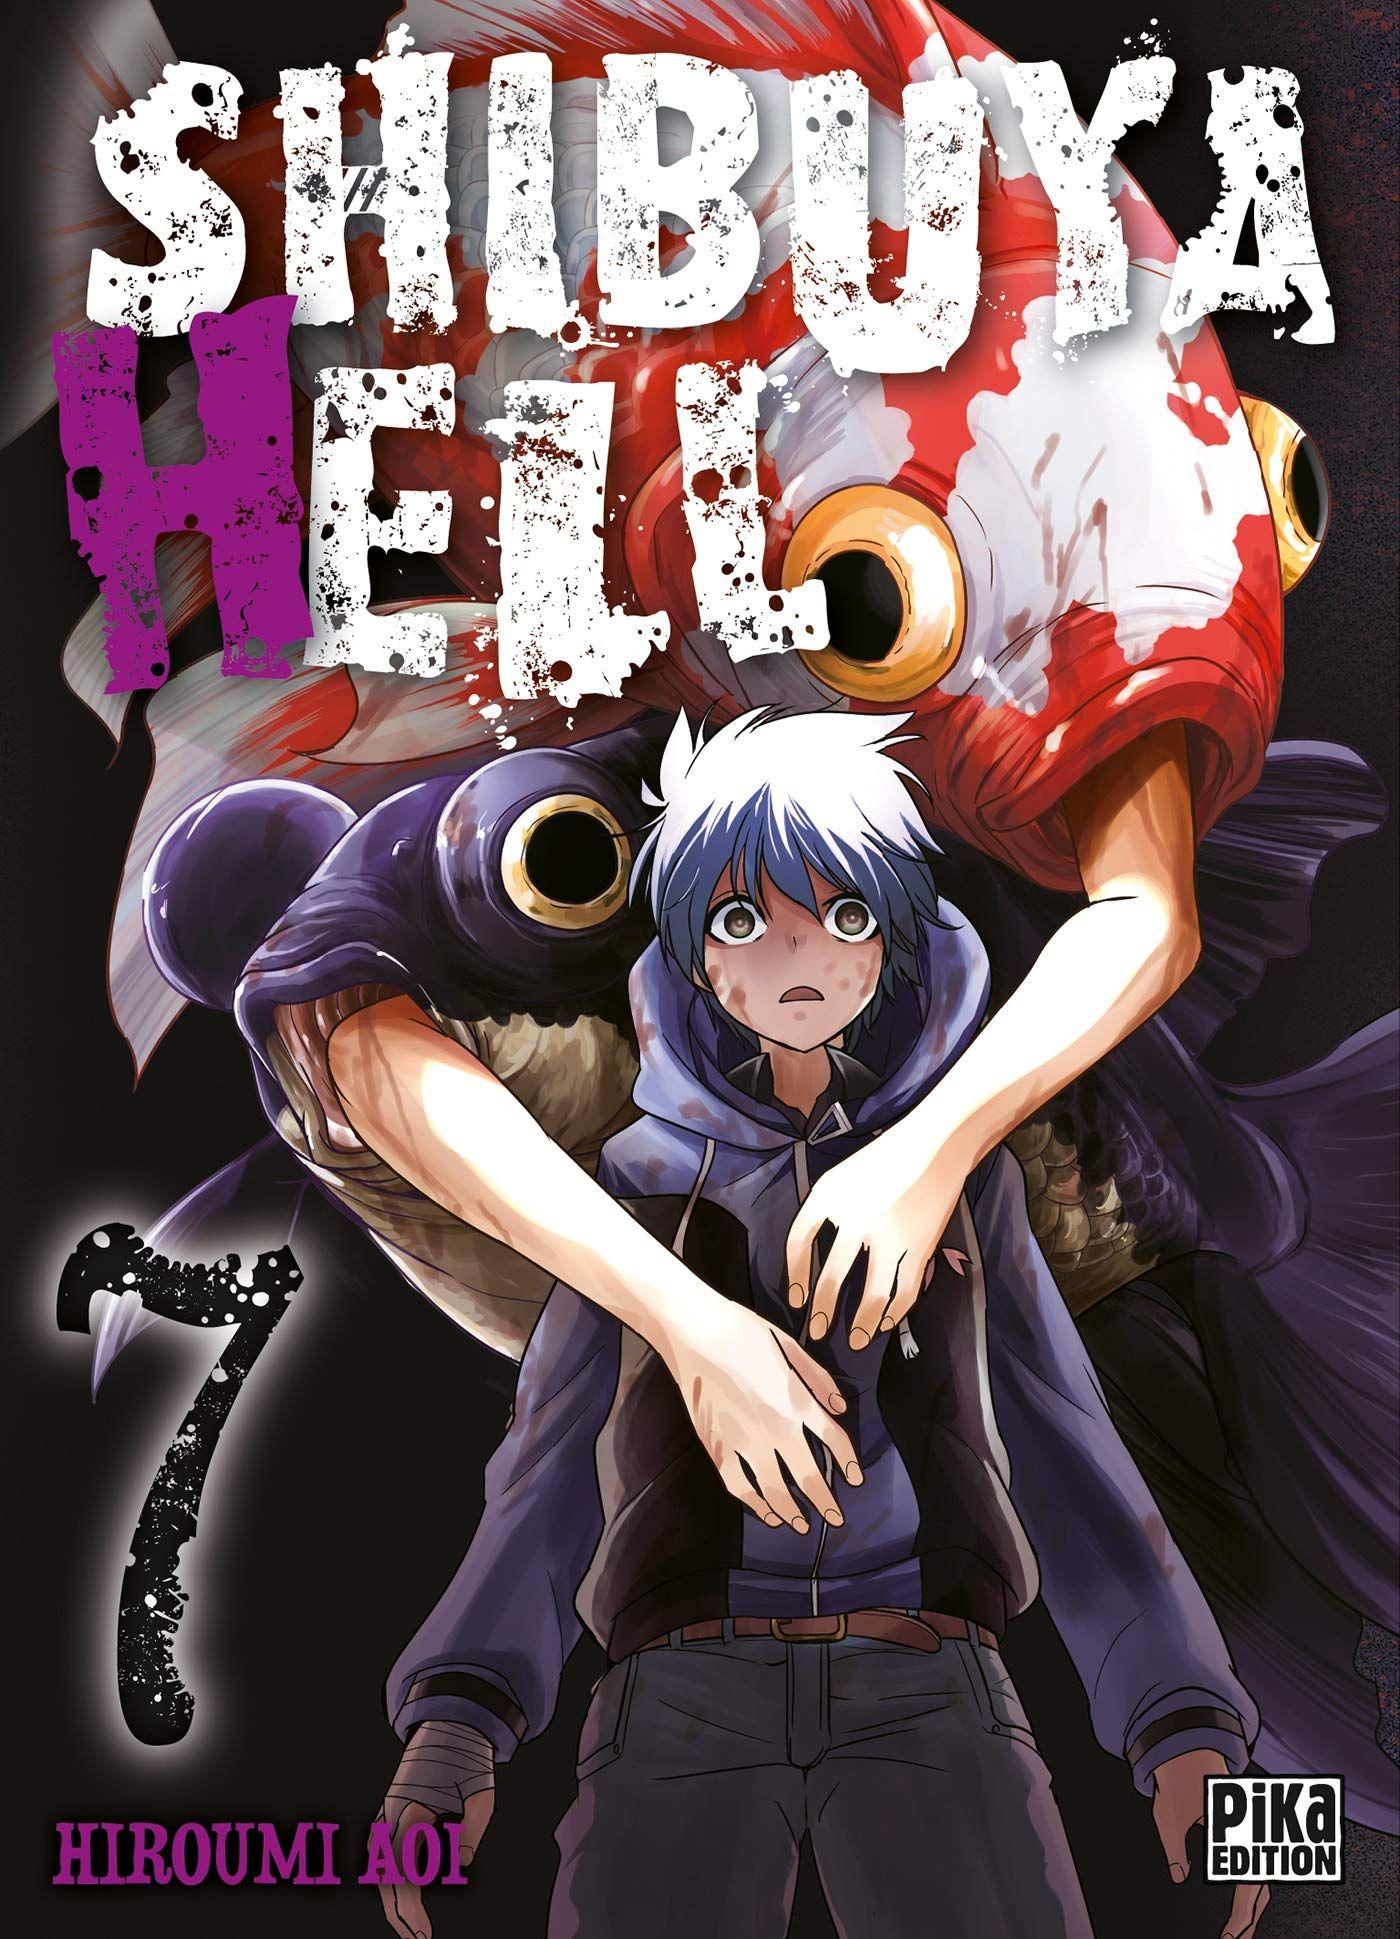 Sortie Manga au Québec JUIN 2021 Shibuya-hell-7-pika